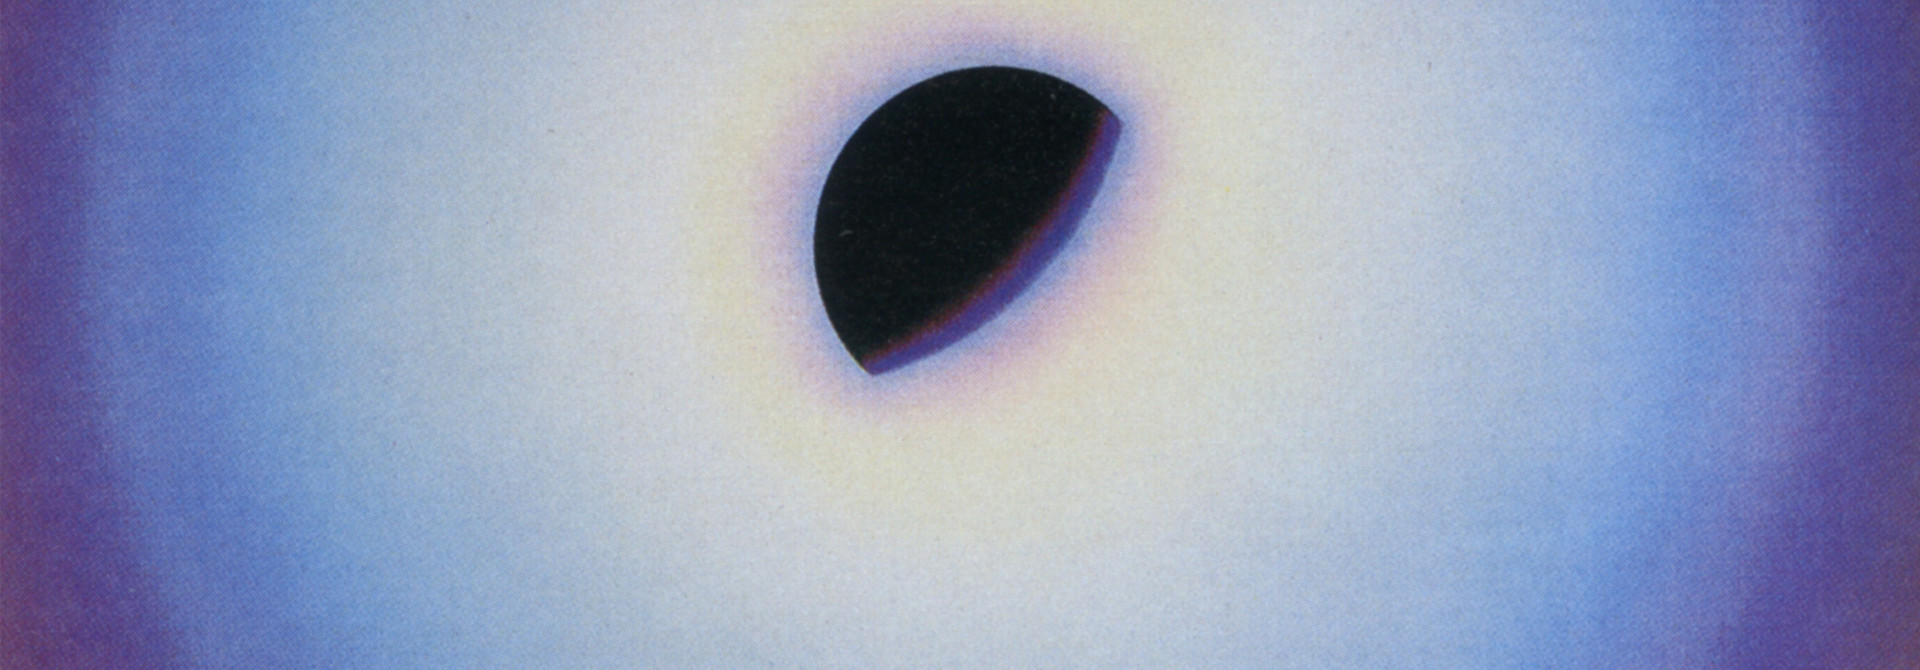 Artistes Variés • Somewhere Between : Mutant Pop, Electronic Minimalism & Shadow Sounds of Japan 1980-1988